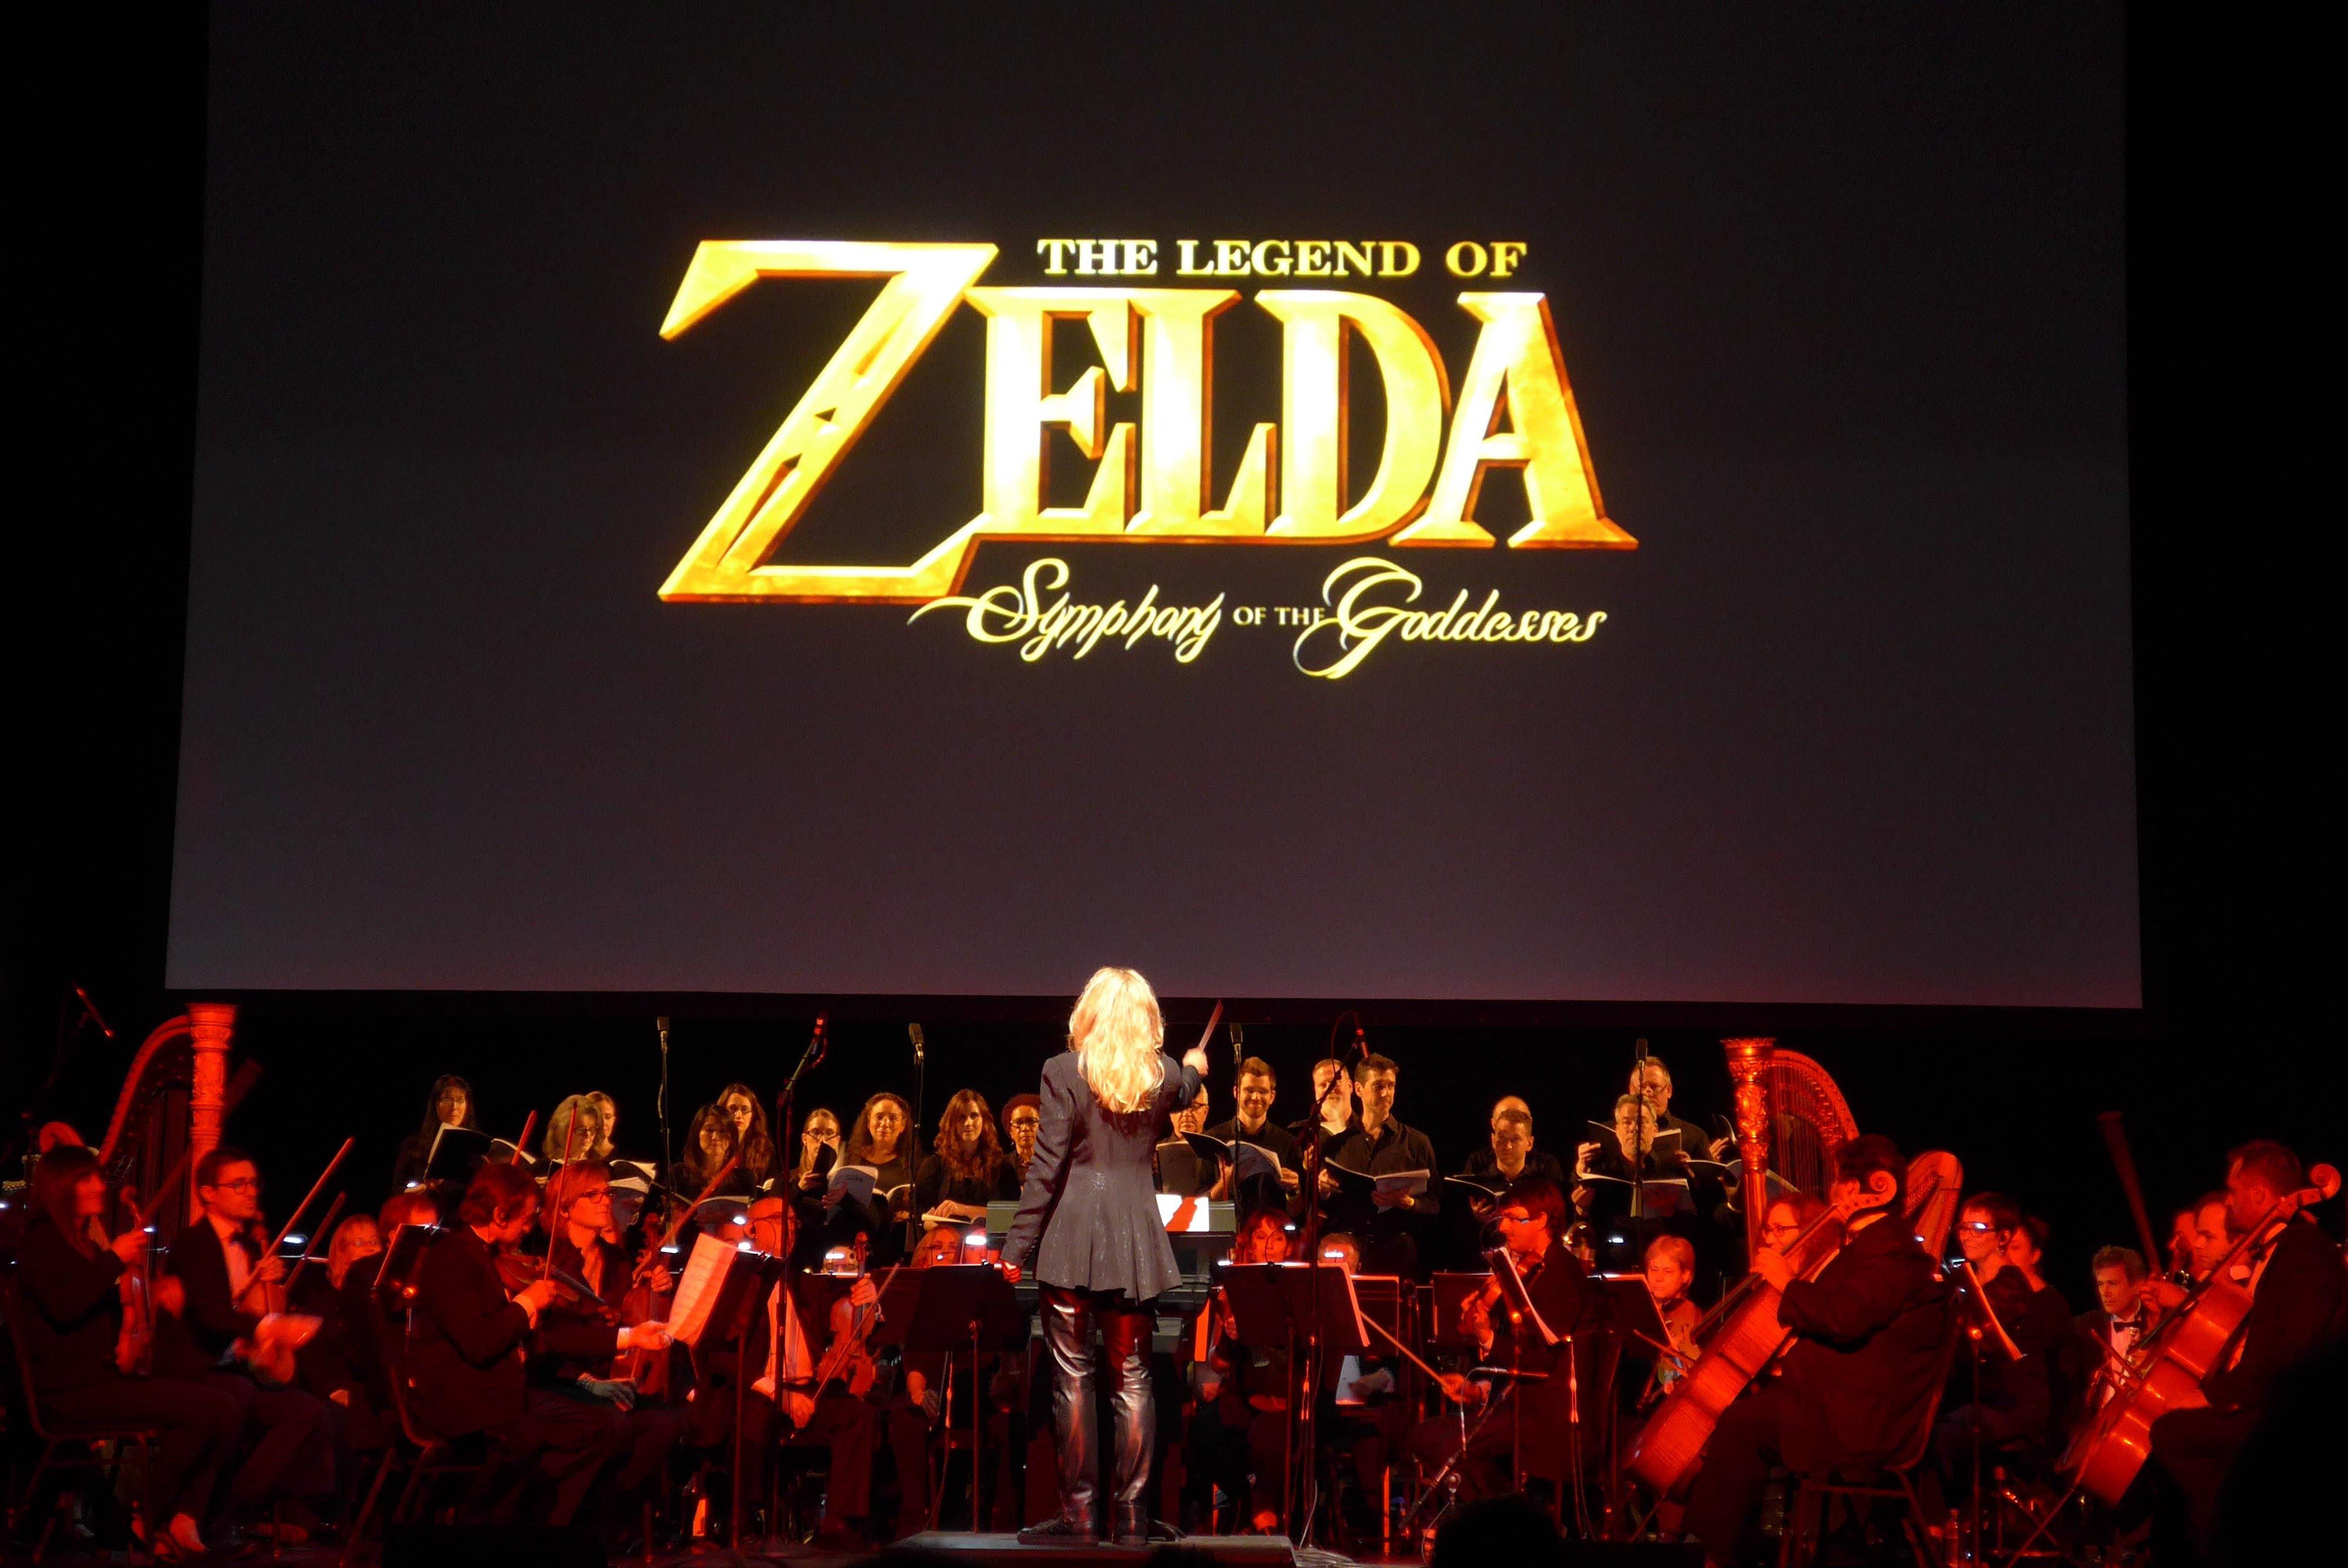 musica videojuegos